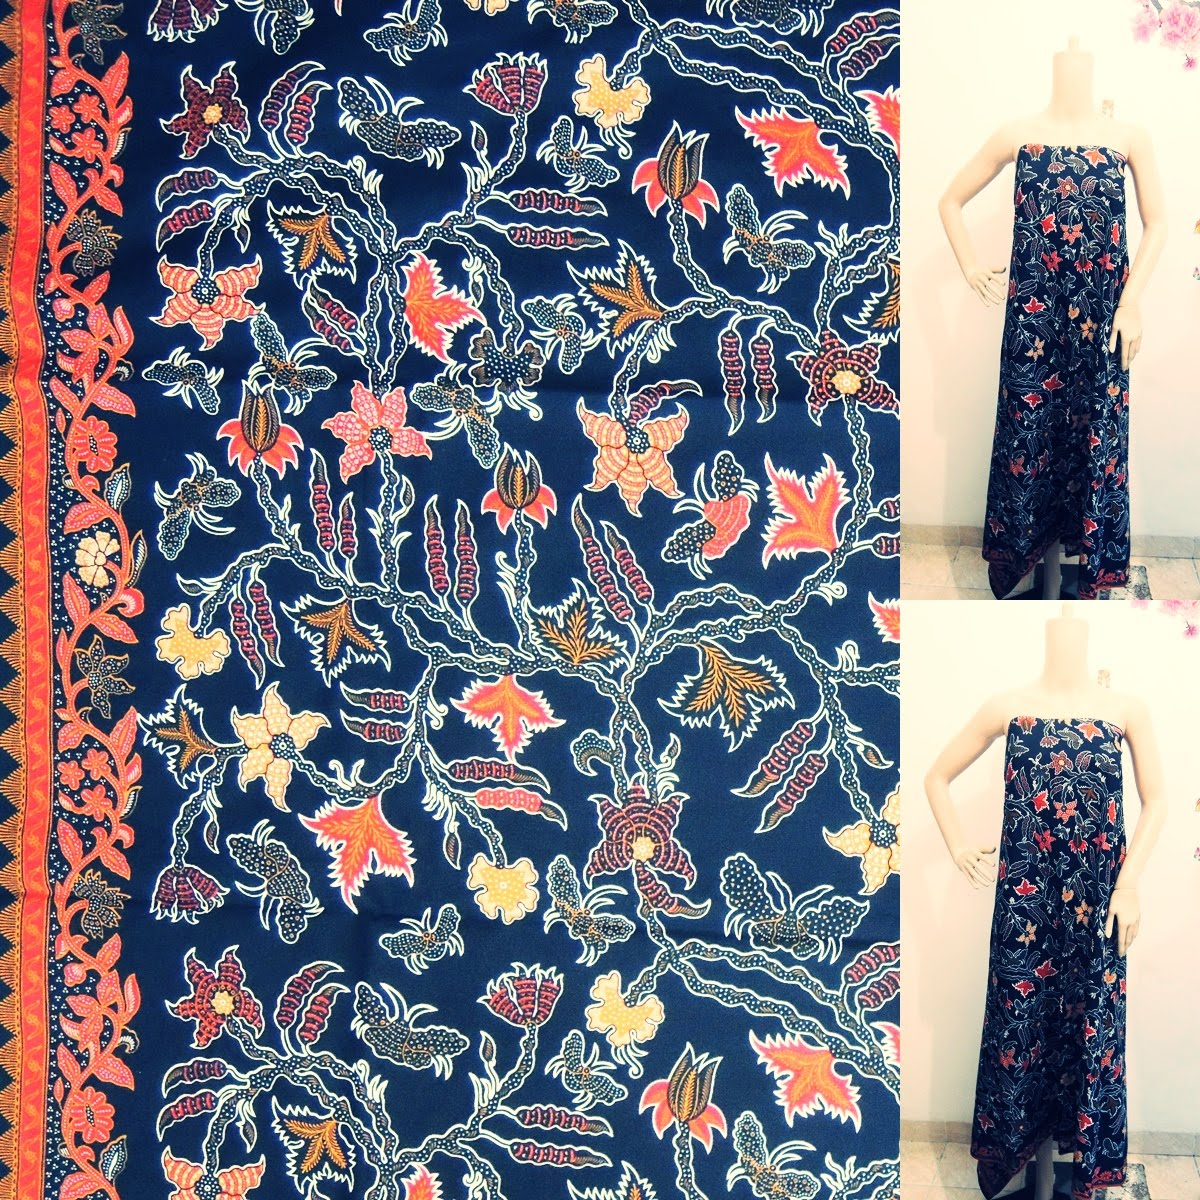 Palastri Shop   Gabriella Shop  kain batik cantik murah motif asam hitam b3fd94d6c5